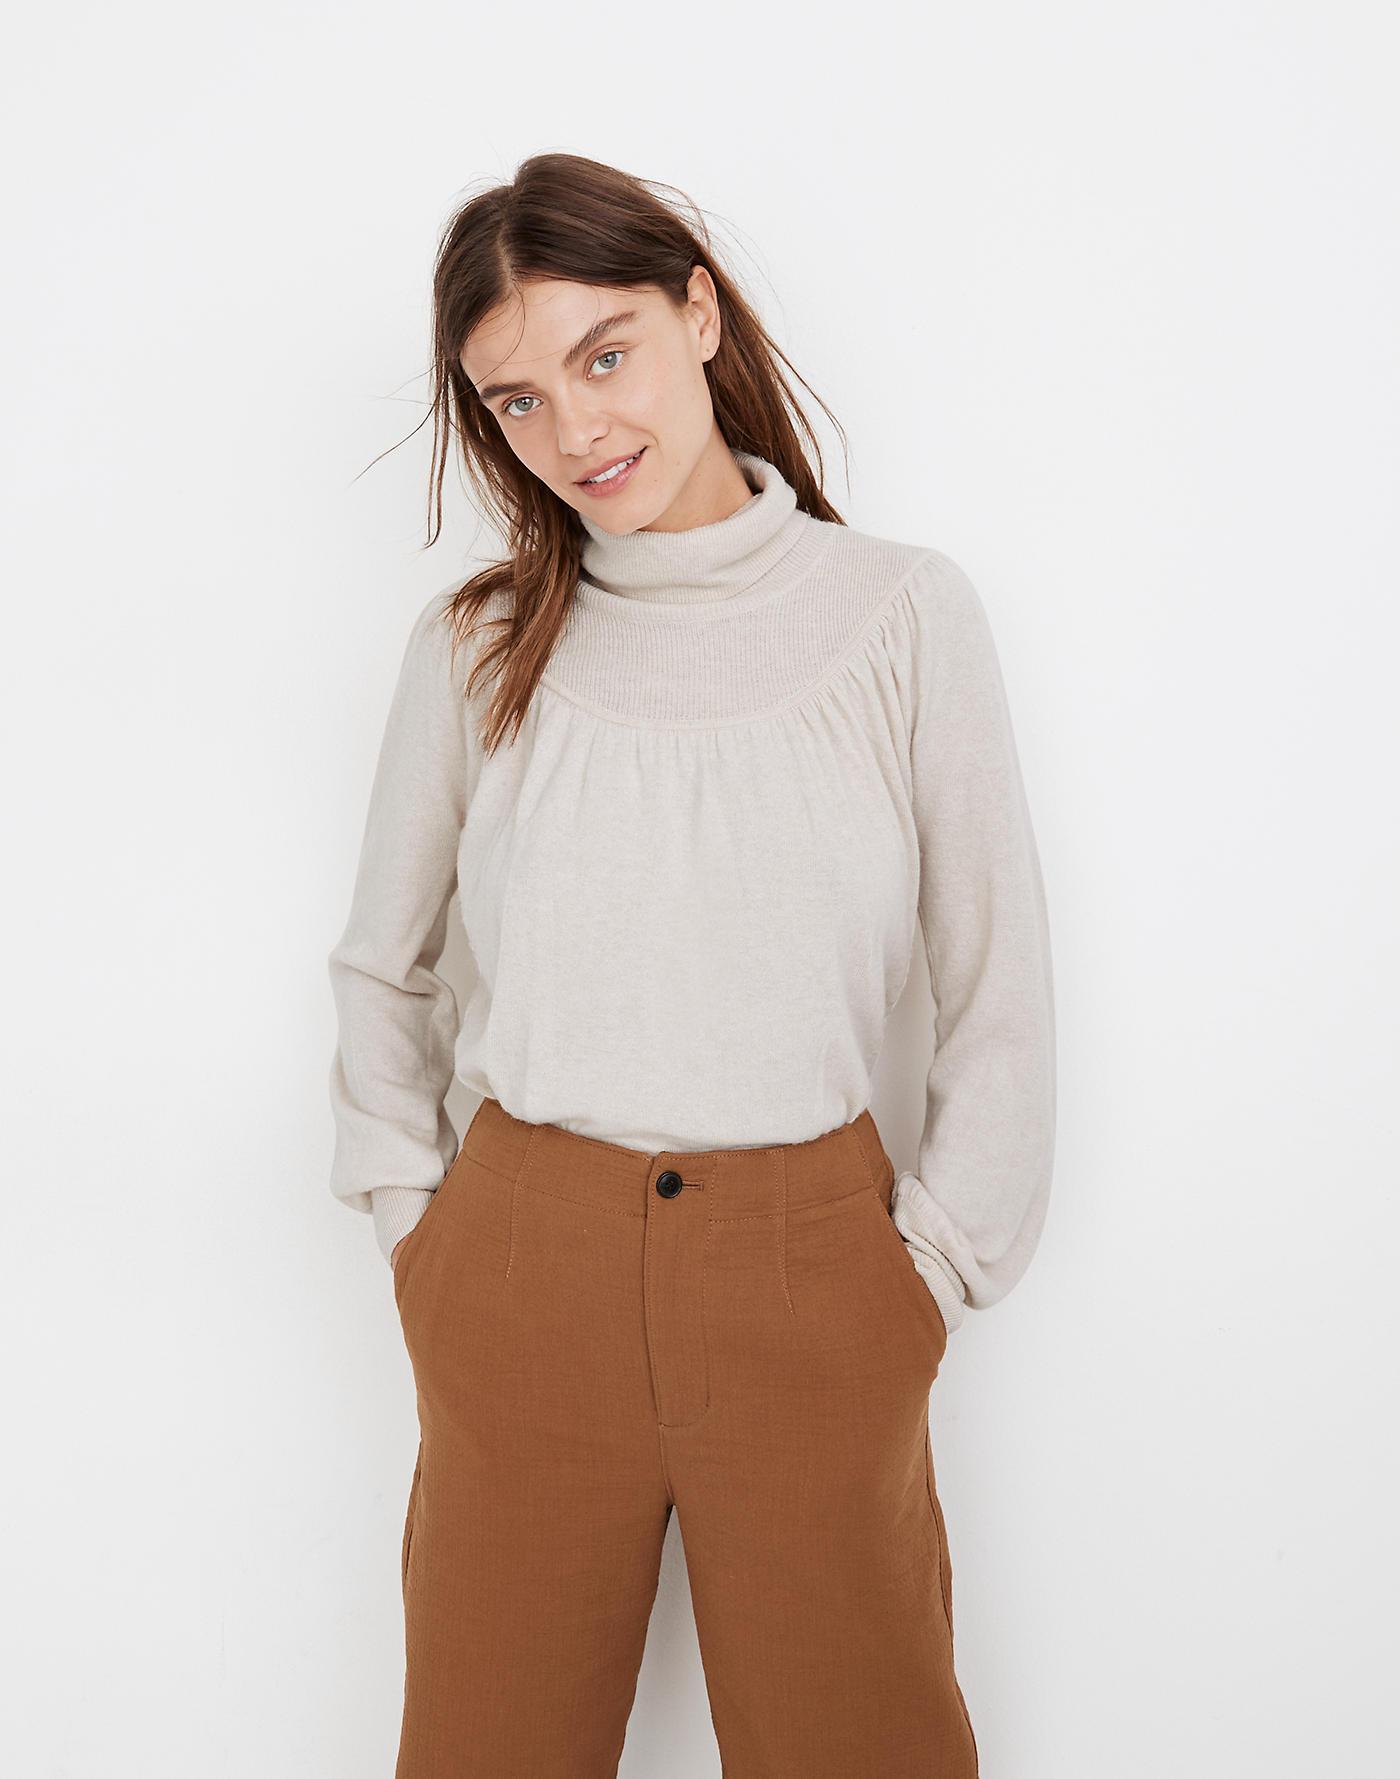 Madewell secret stock sale turtleneck sweater